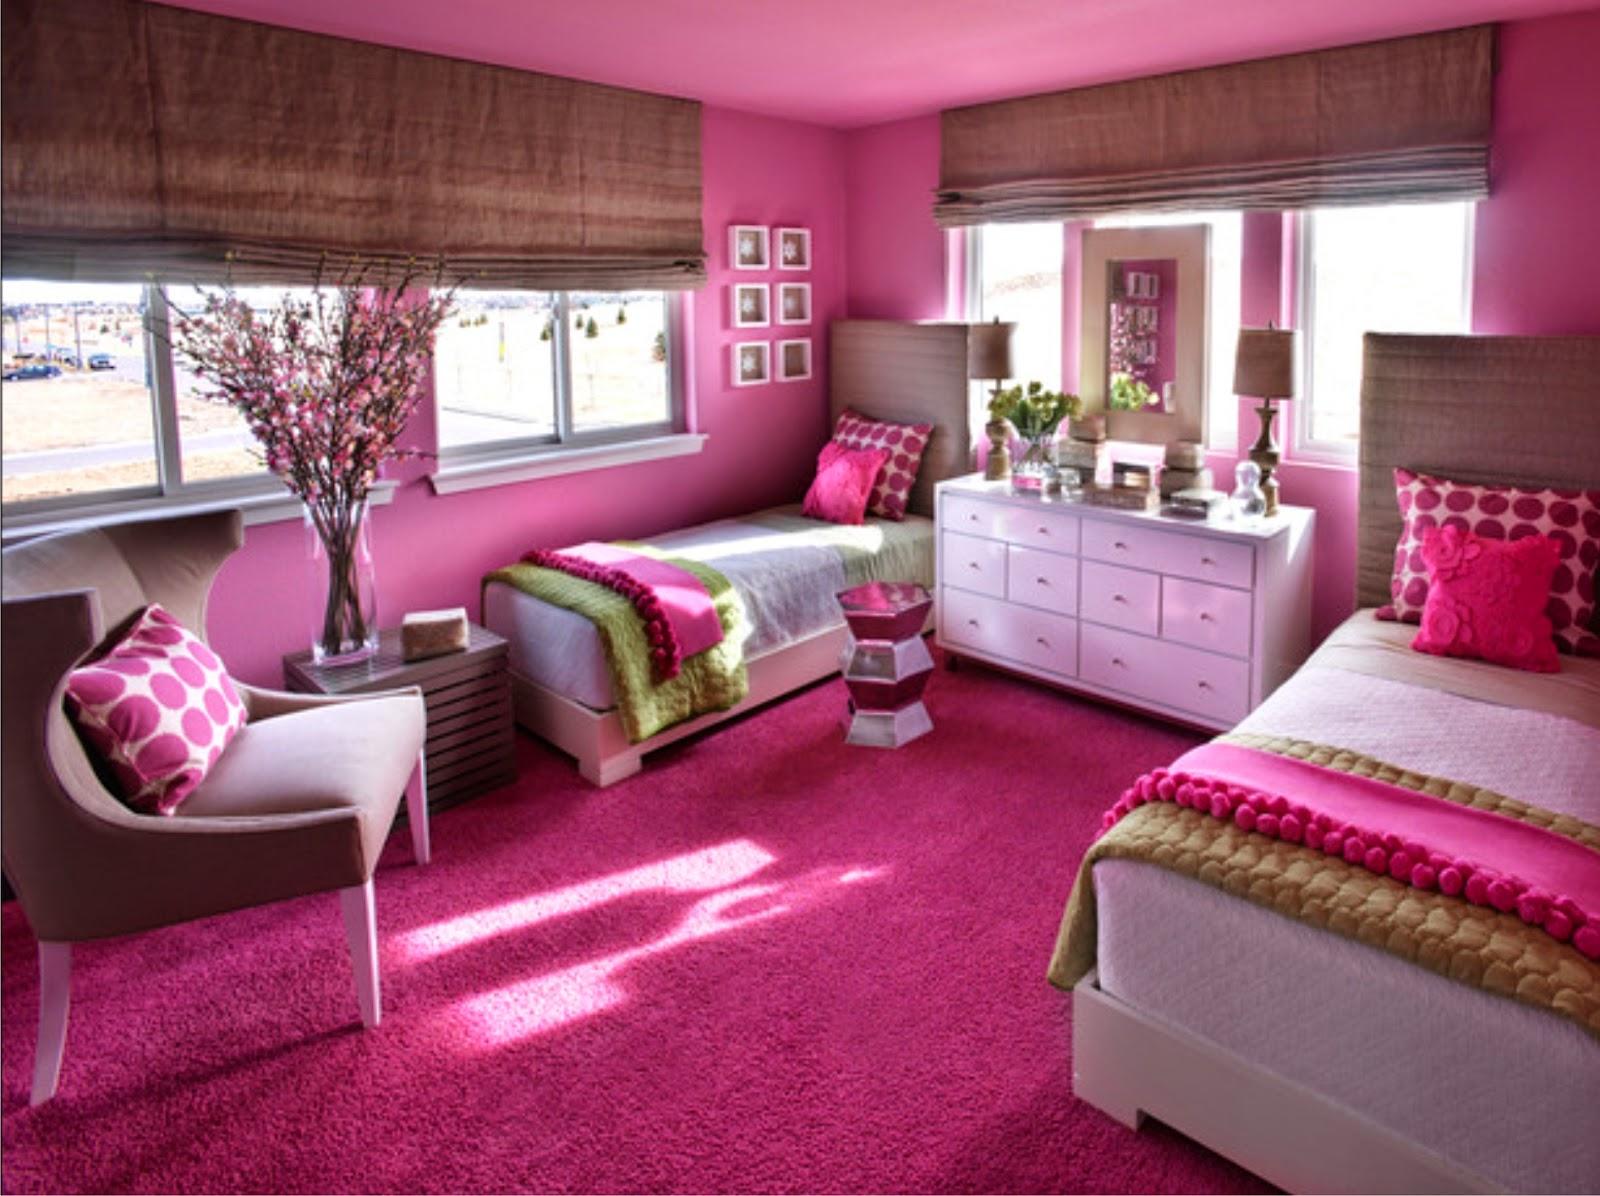 cara menata kamar tidur yang baik